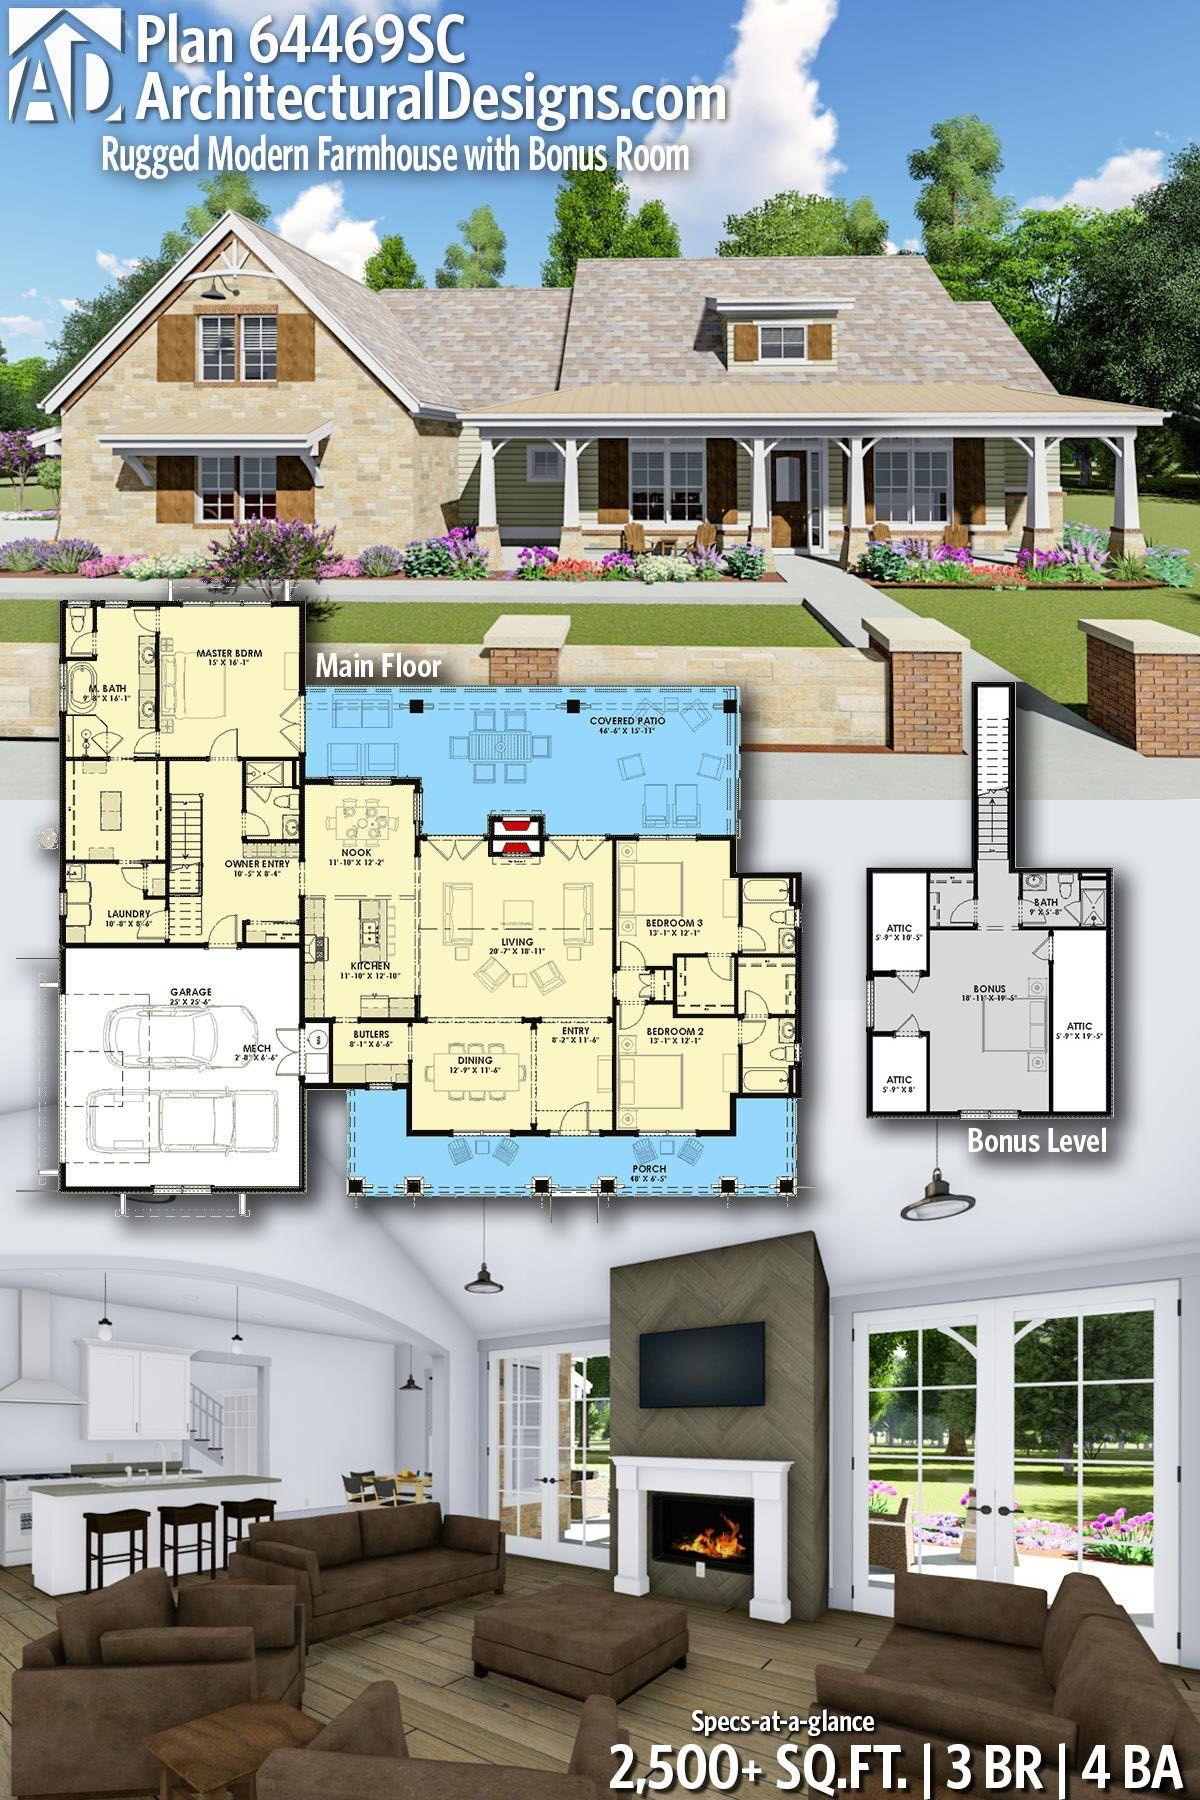 Plan 64469SC: Rugged Modern Farmhouse with Bonus Room